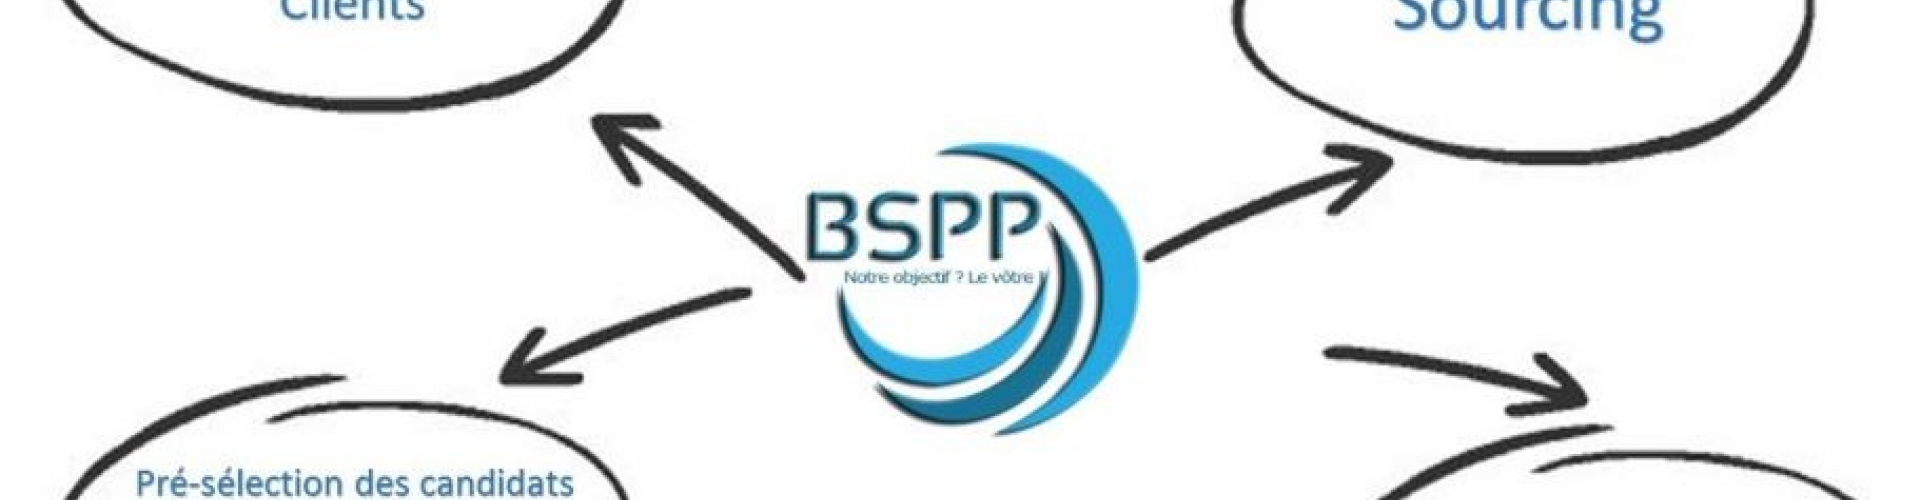 image BSPP